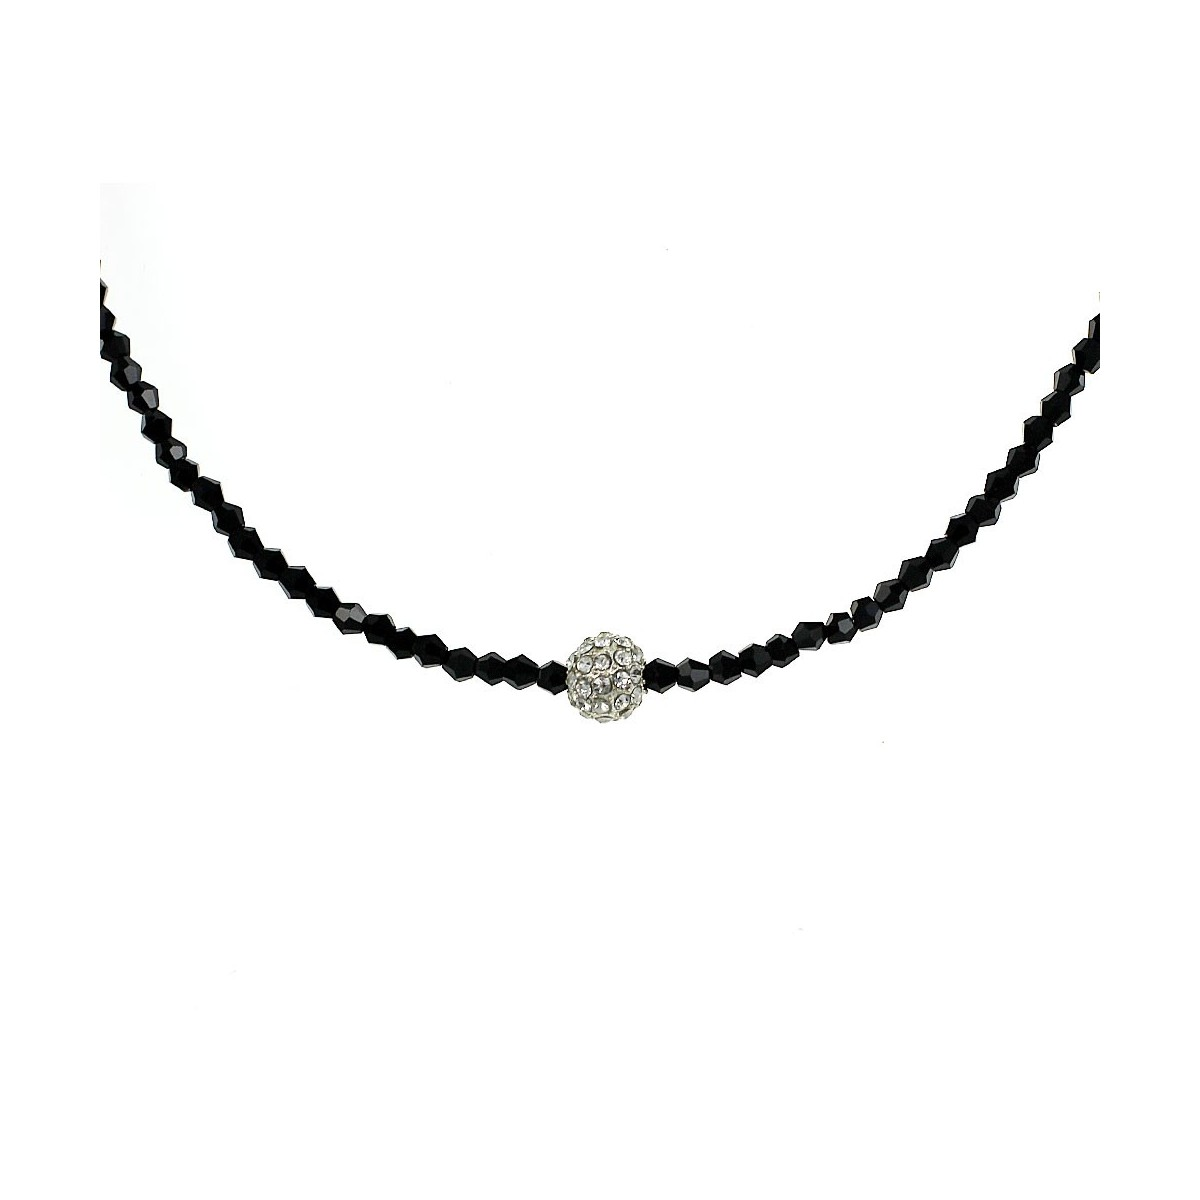 Collier perle de strass